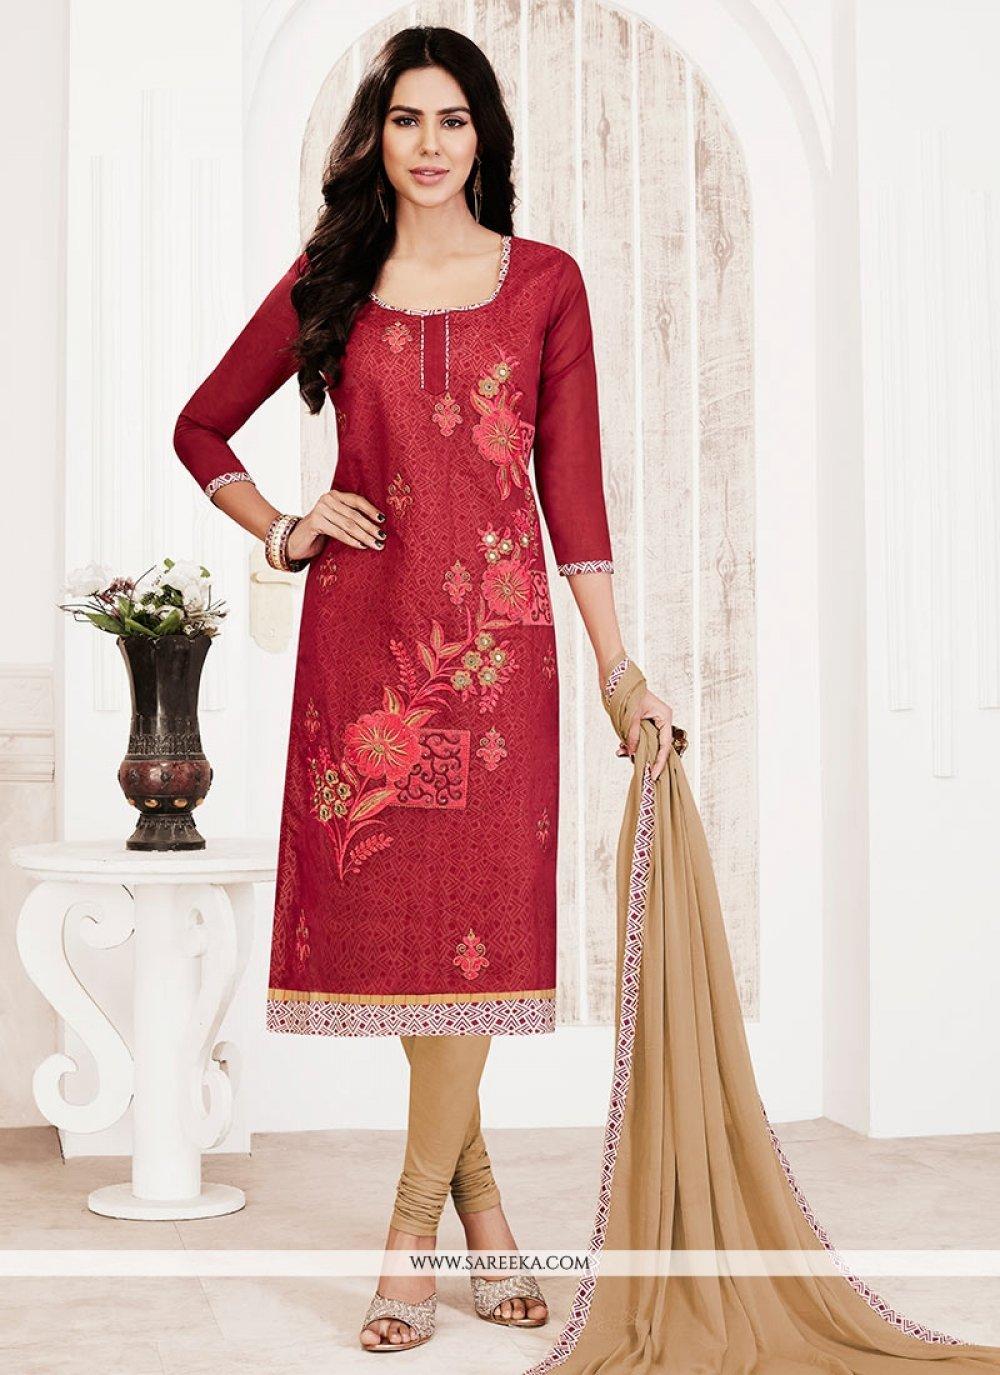 Chanderi Lace Work Churidar Suit